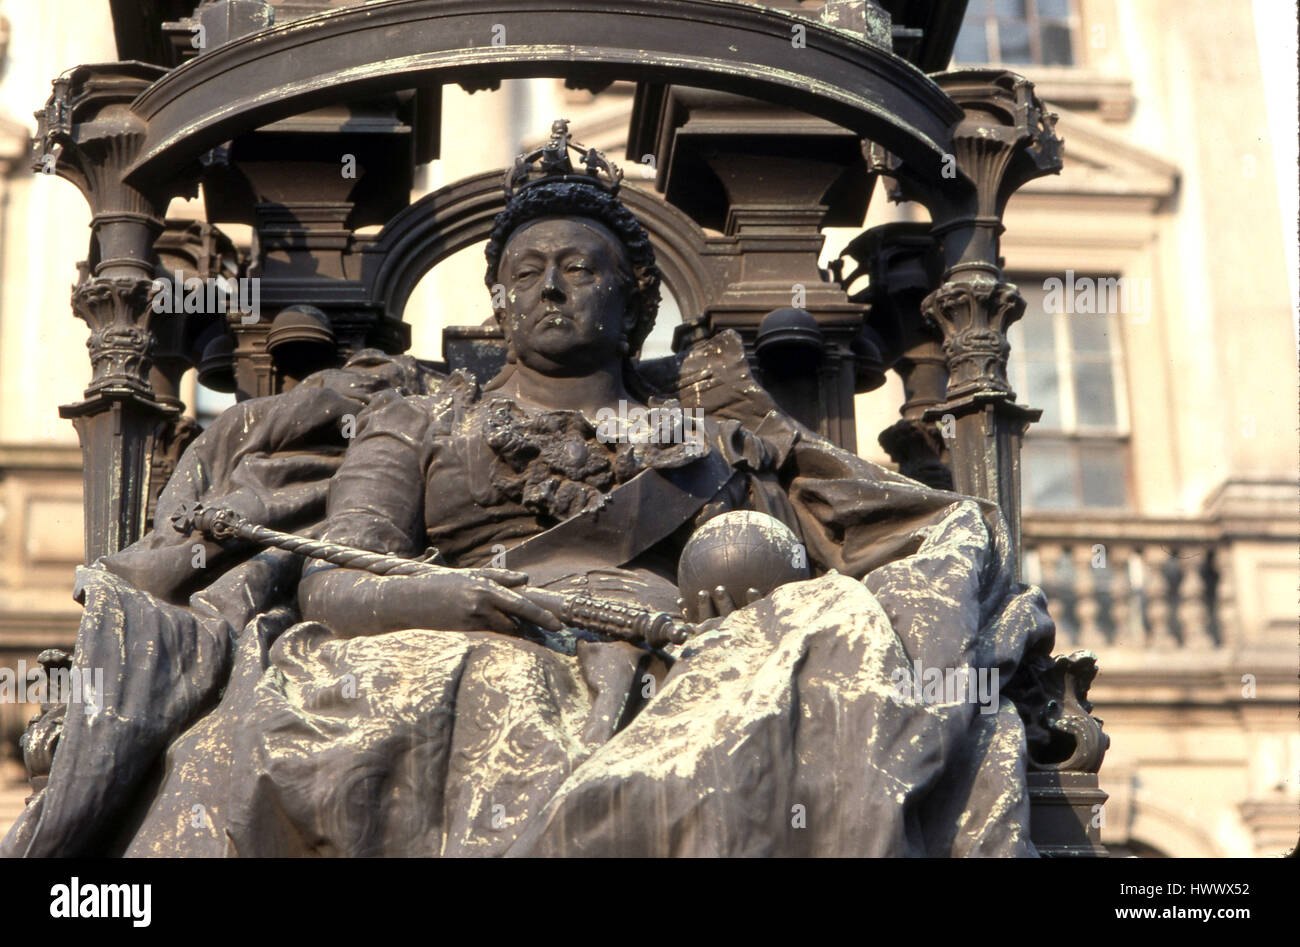 Queen Victoria Buckingham Palace - Stock Image